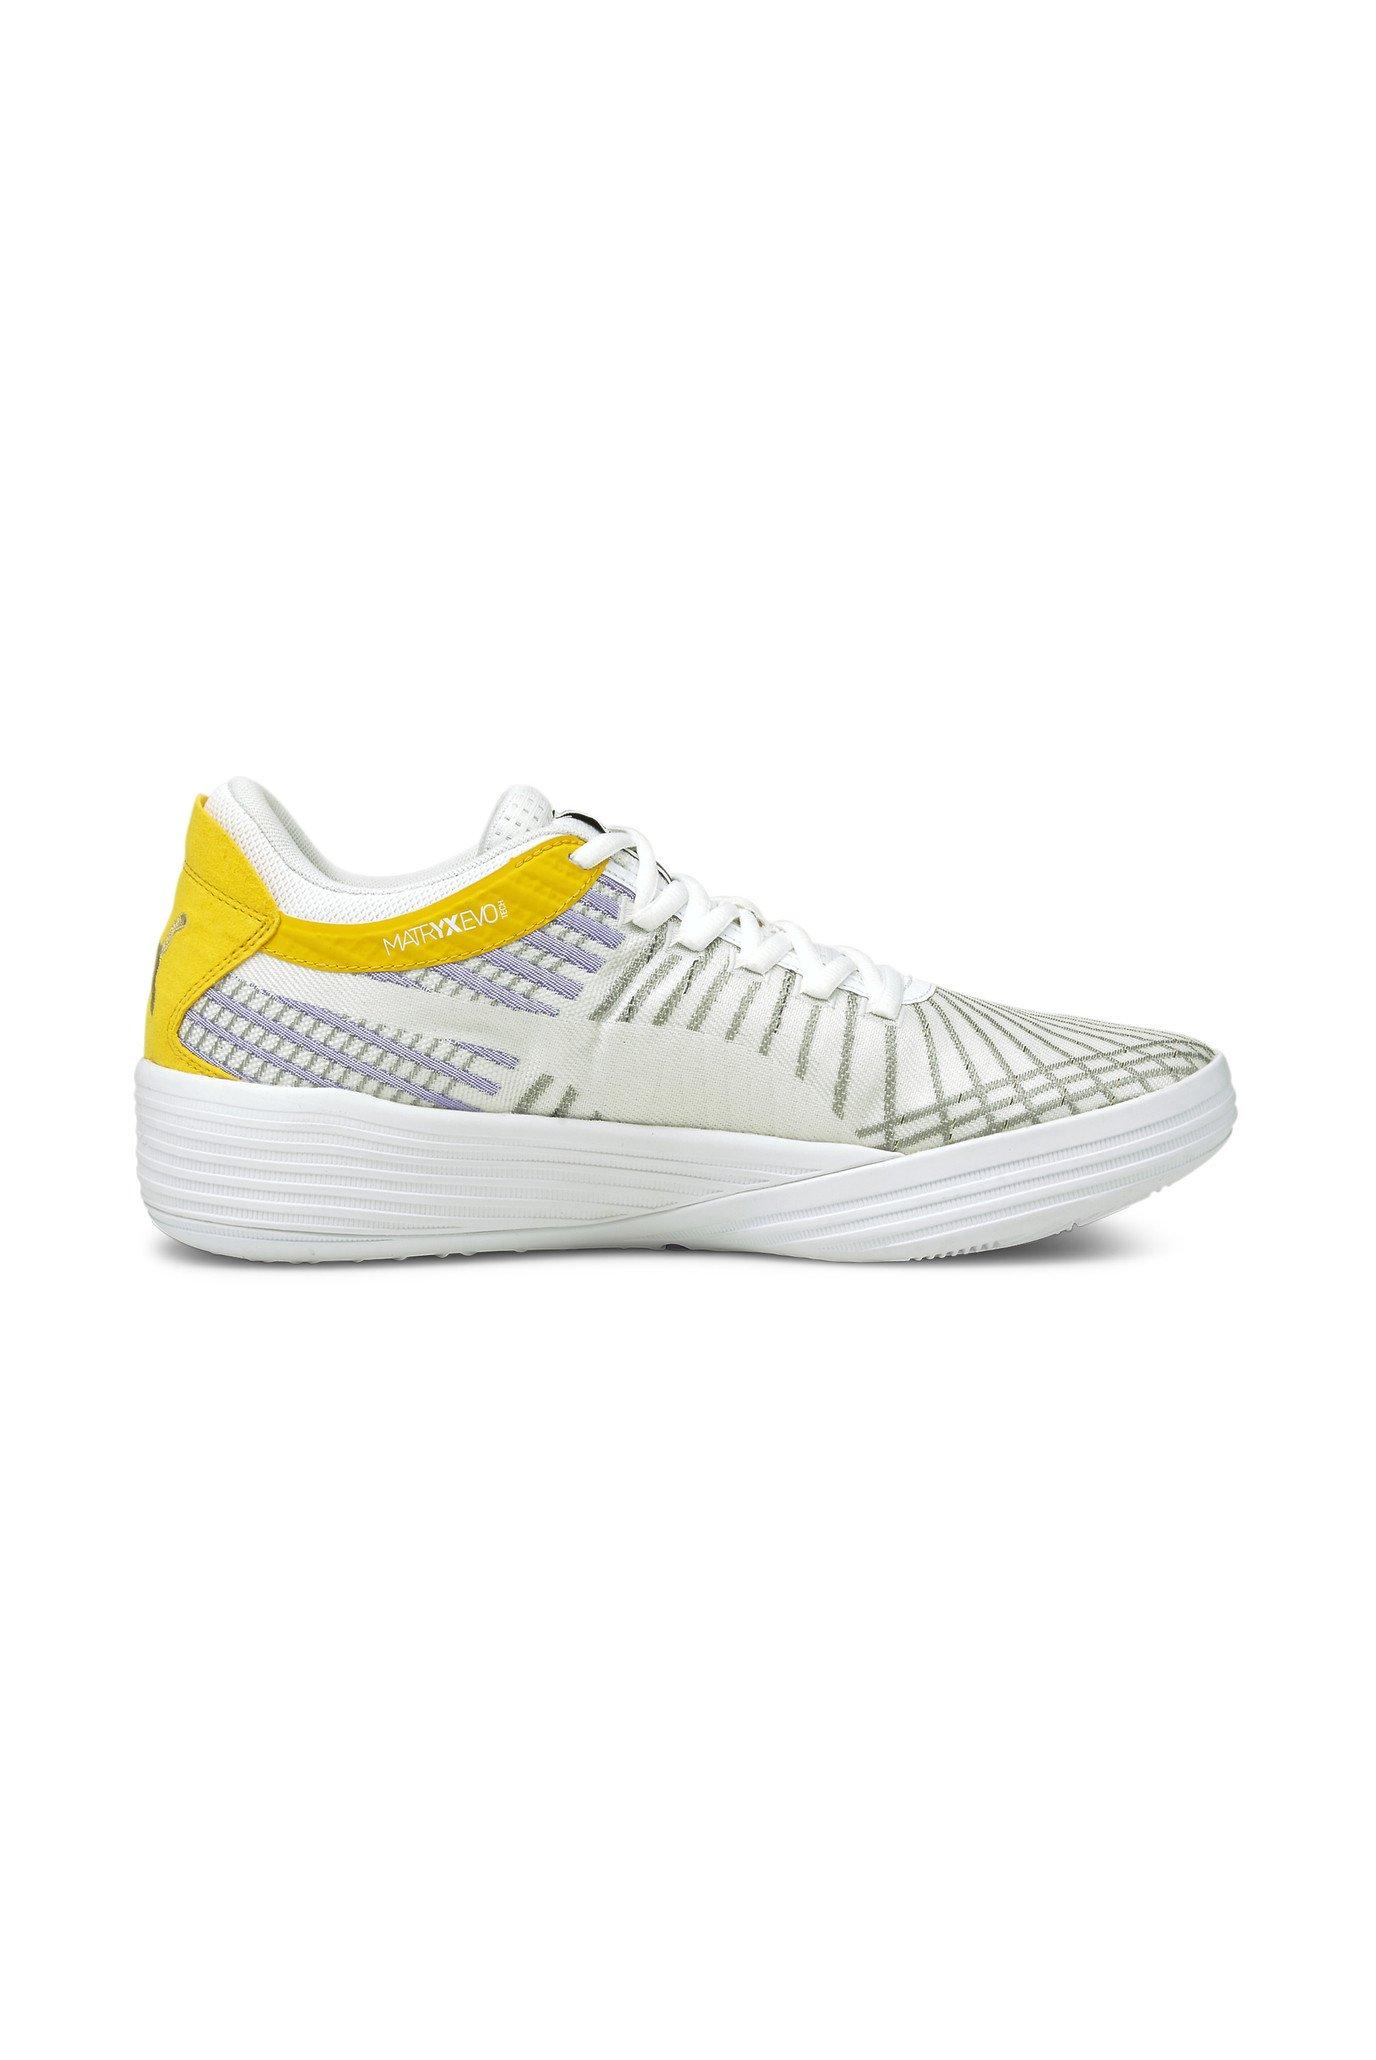 Кросівки Clyde All-Pro Coast 2 Coast Basketball Shoes 1